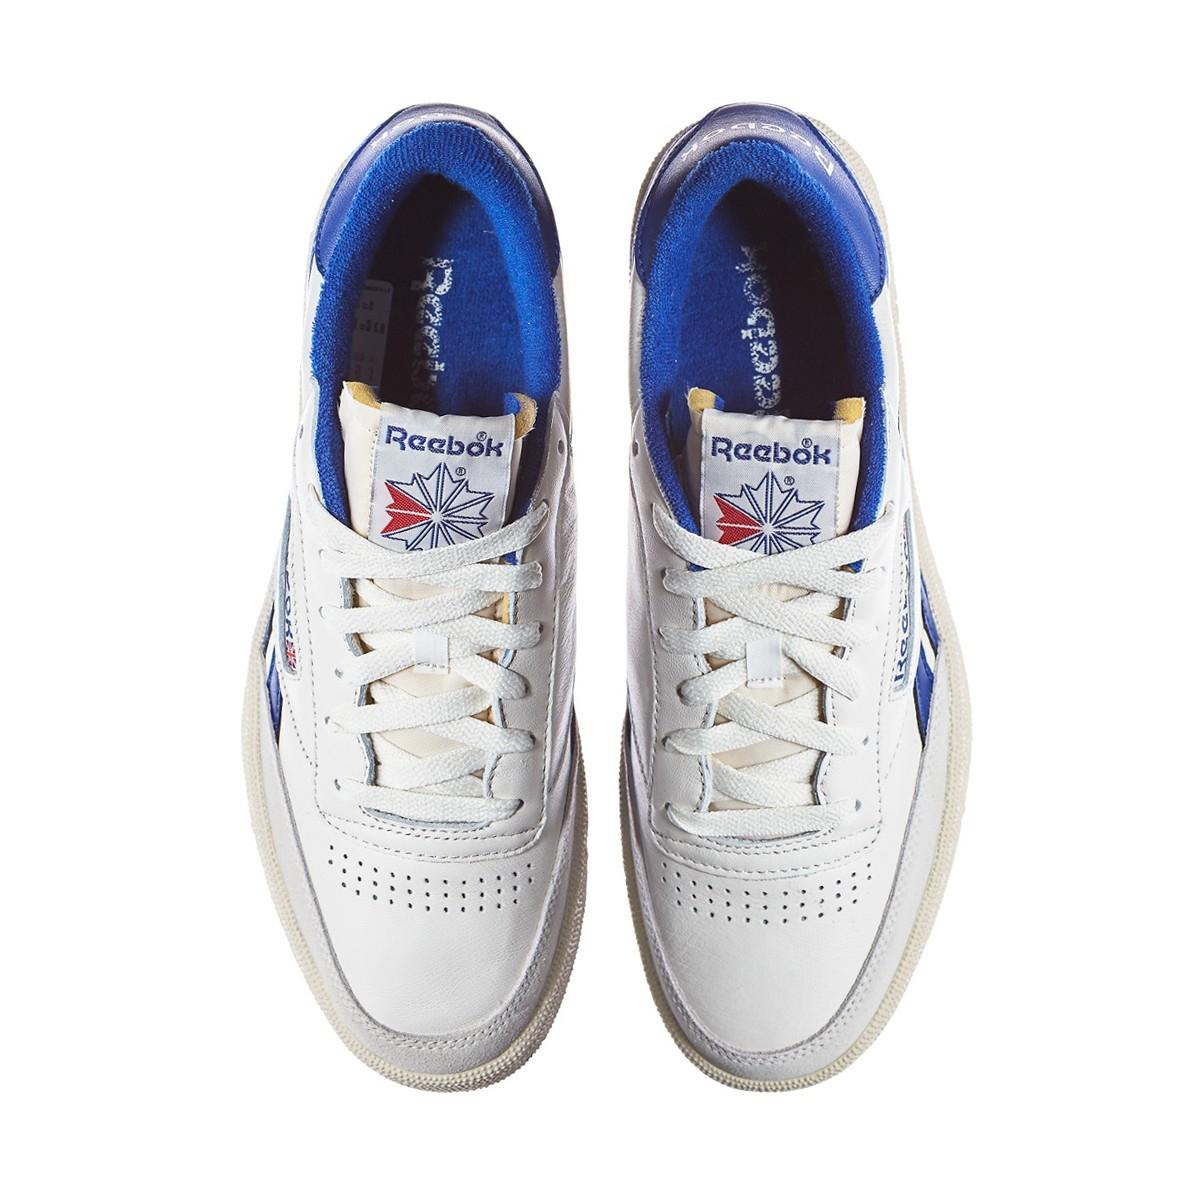 0f8c5b012cb Lyst - Reebok Revenge Plus Vintage Sneakers in Blue for Men